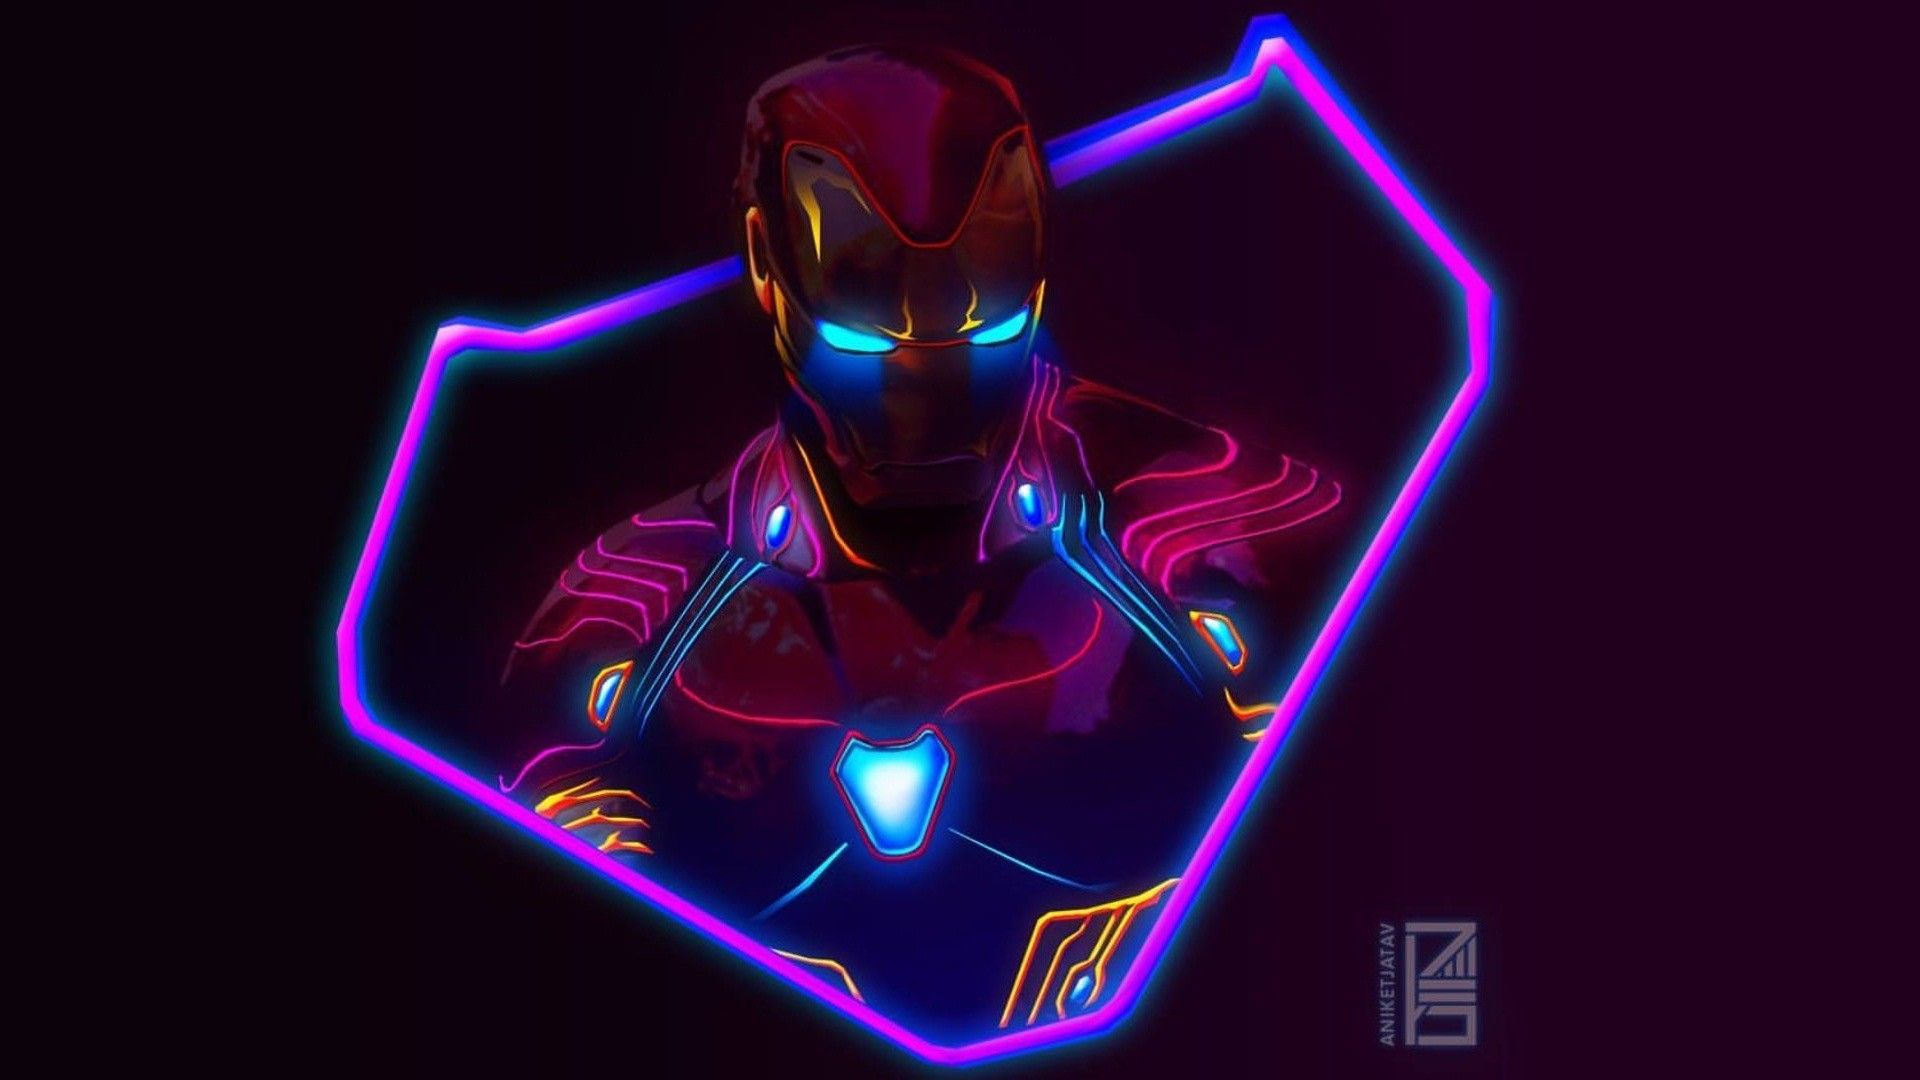 Avengers Infinity War Characters Wallpaper   Best HD Wallpapers   Wallpaperscute   Avengers ...